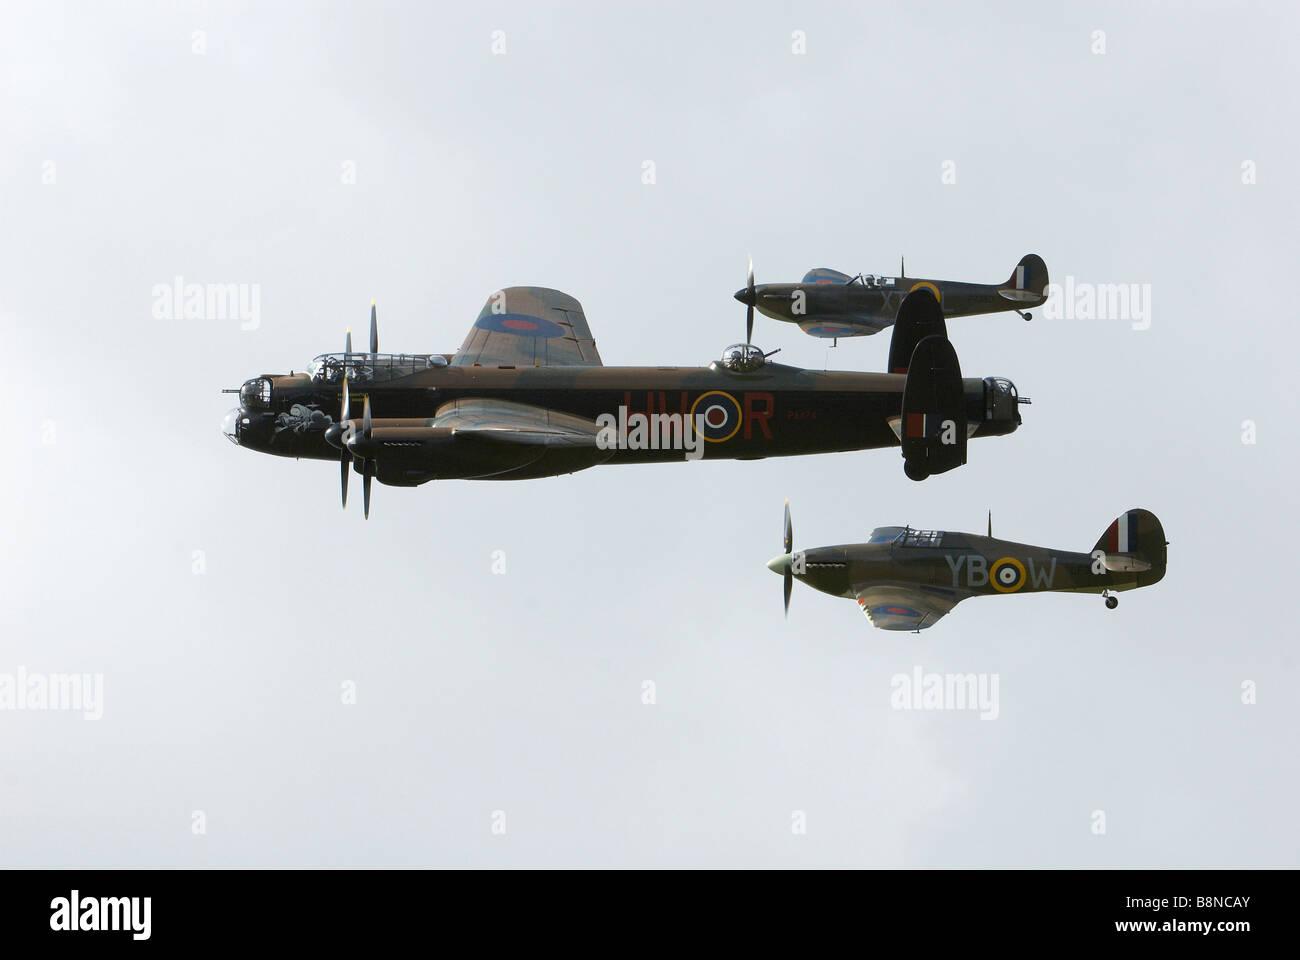 Battle of Britian Memorial Flight - Stock Image